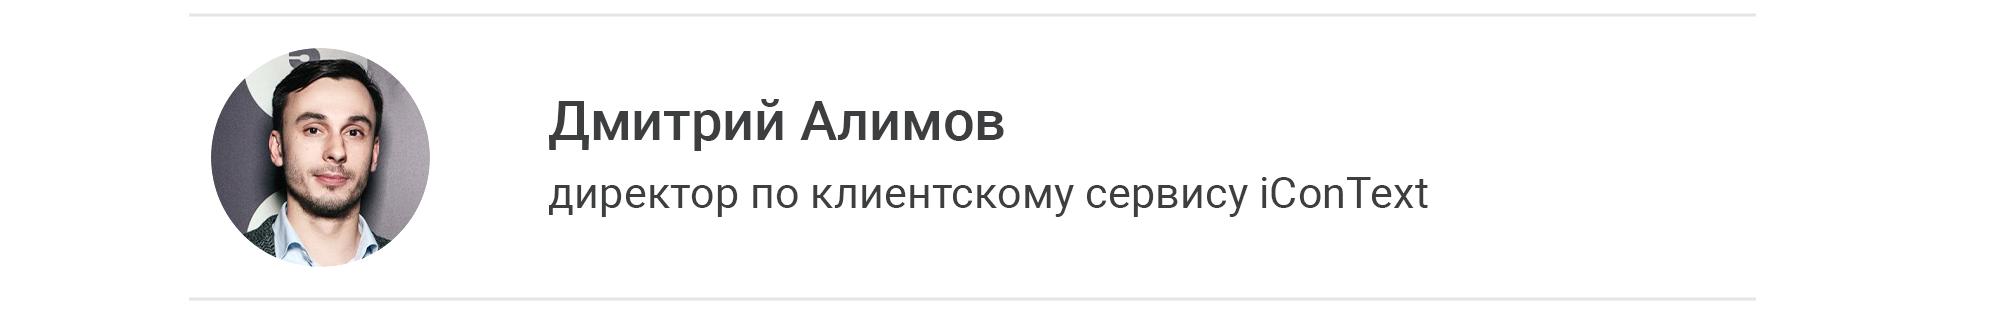 Дмитрий Алимов.png